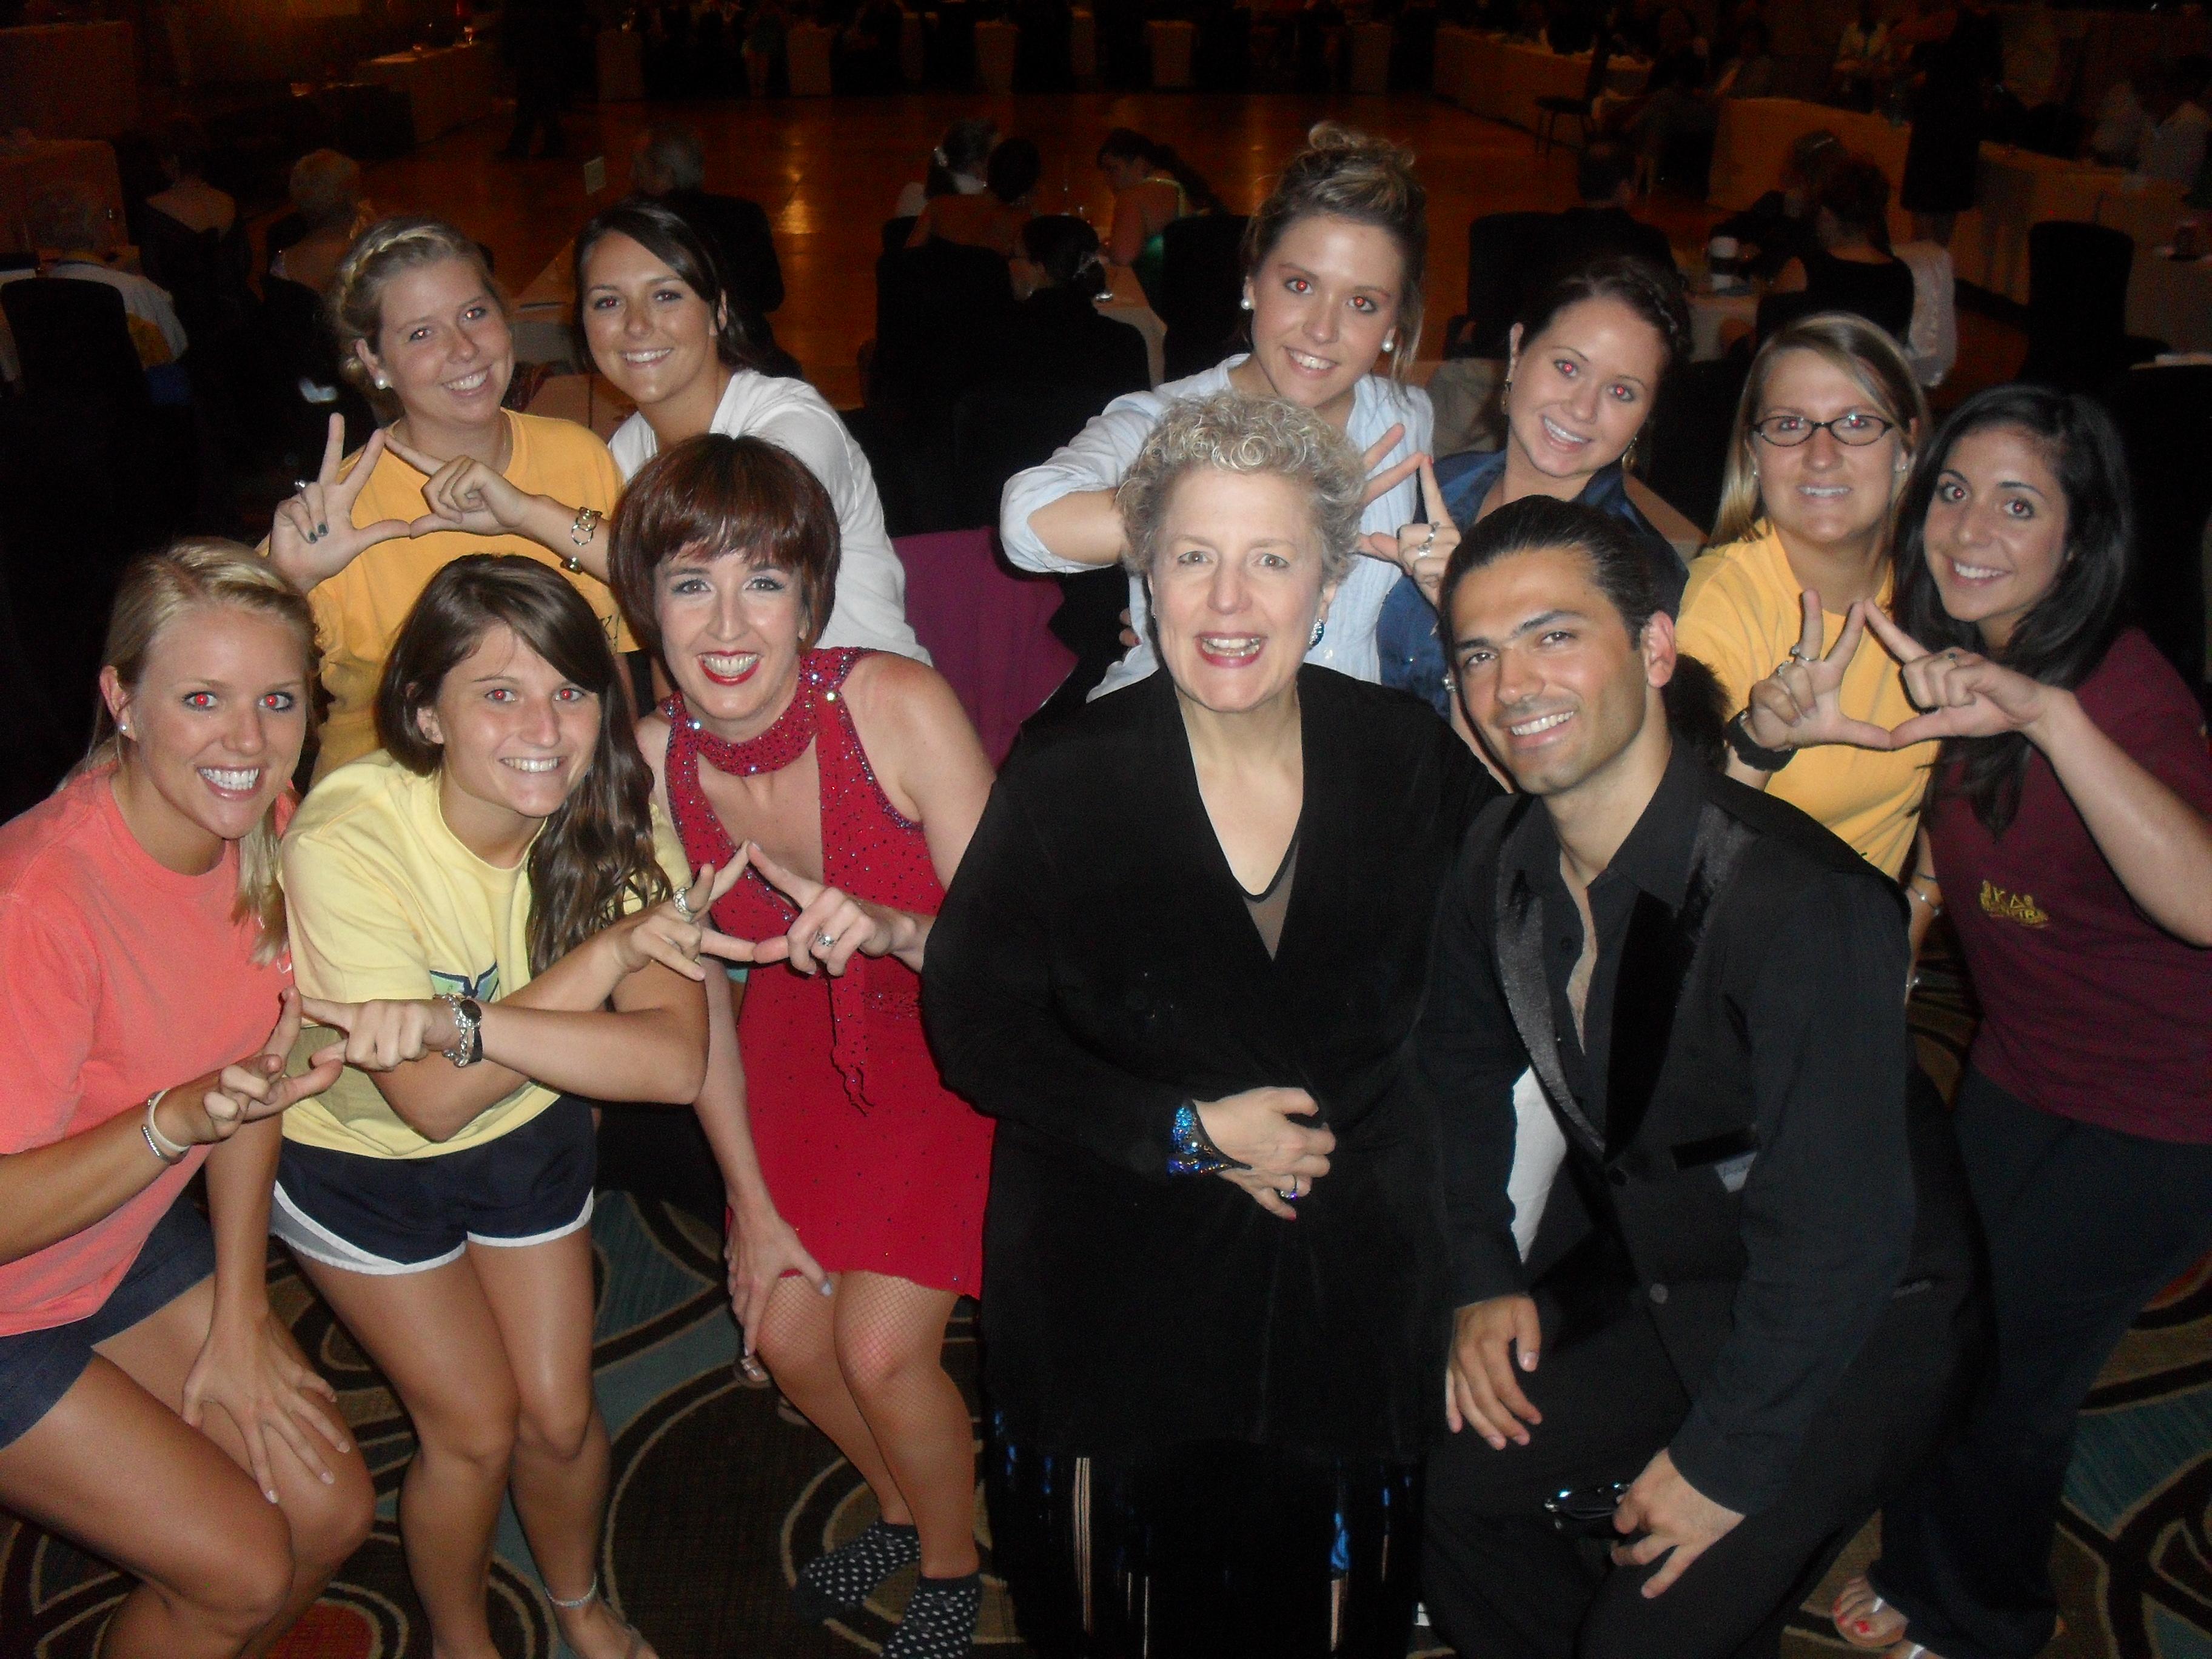 Kappa Deltas, meet ballroom dancers. Dancers, meet KD!